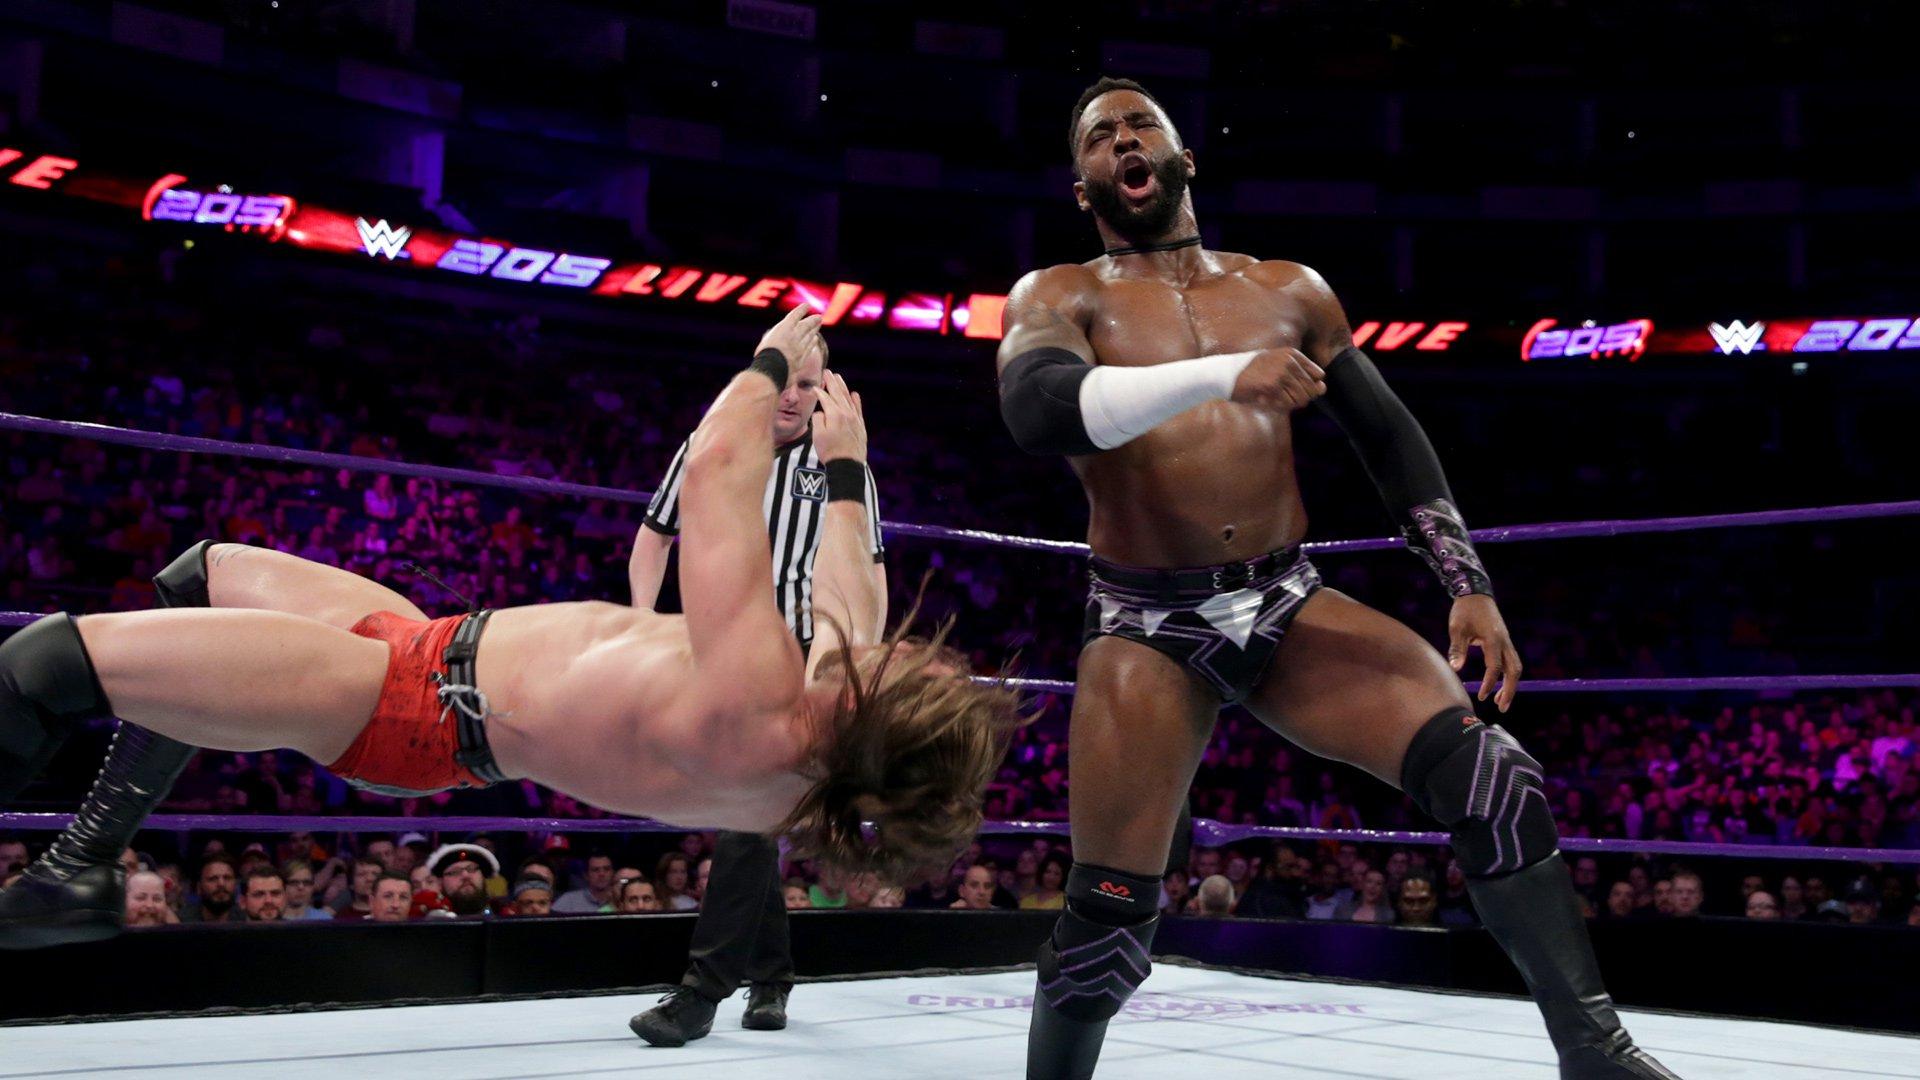 Cedric Alexander, Mustafa Ali & Flash Morgan Webster vs. Drew Gulak, James Drake & Joseph Conners: WWE 205 Live, 15 Mai 2018